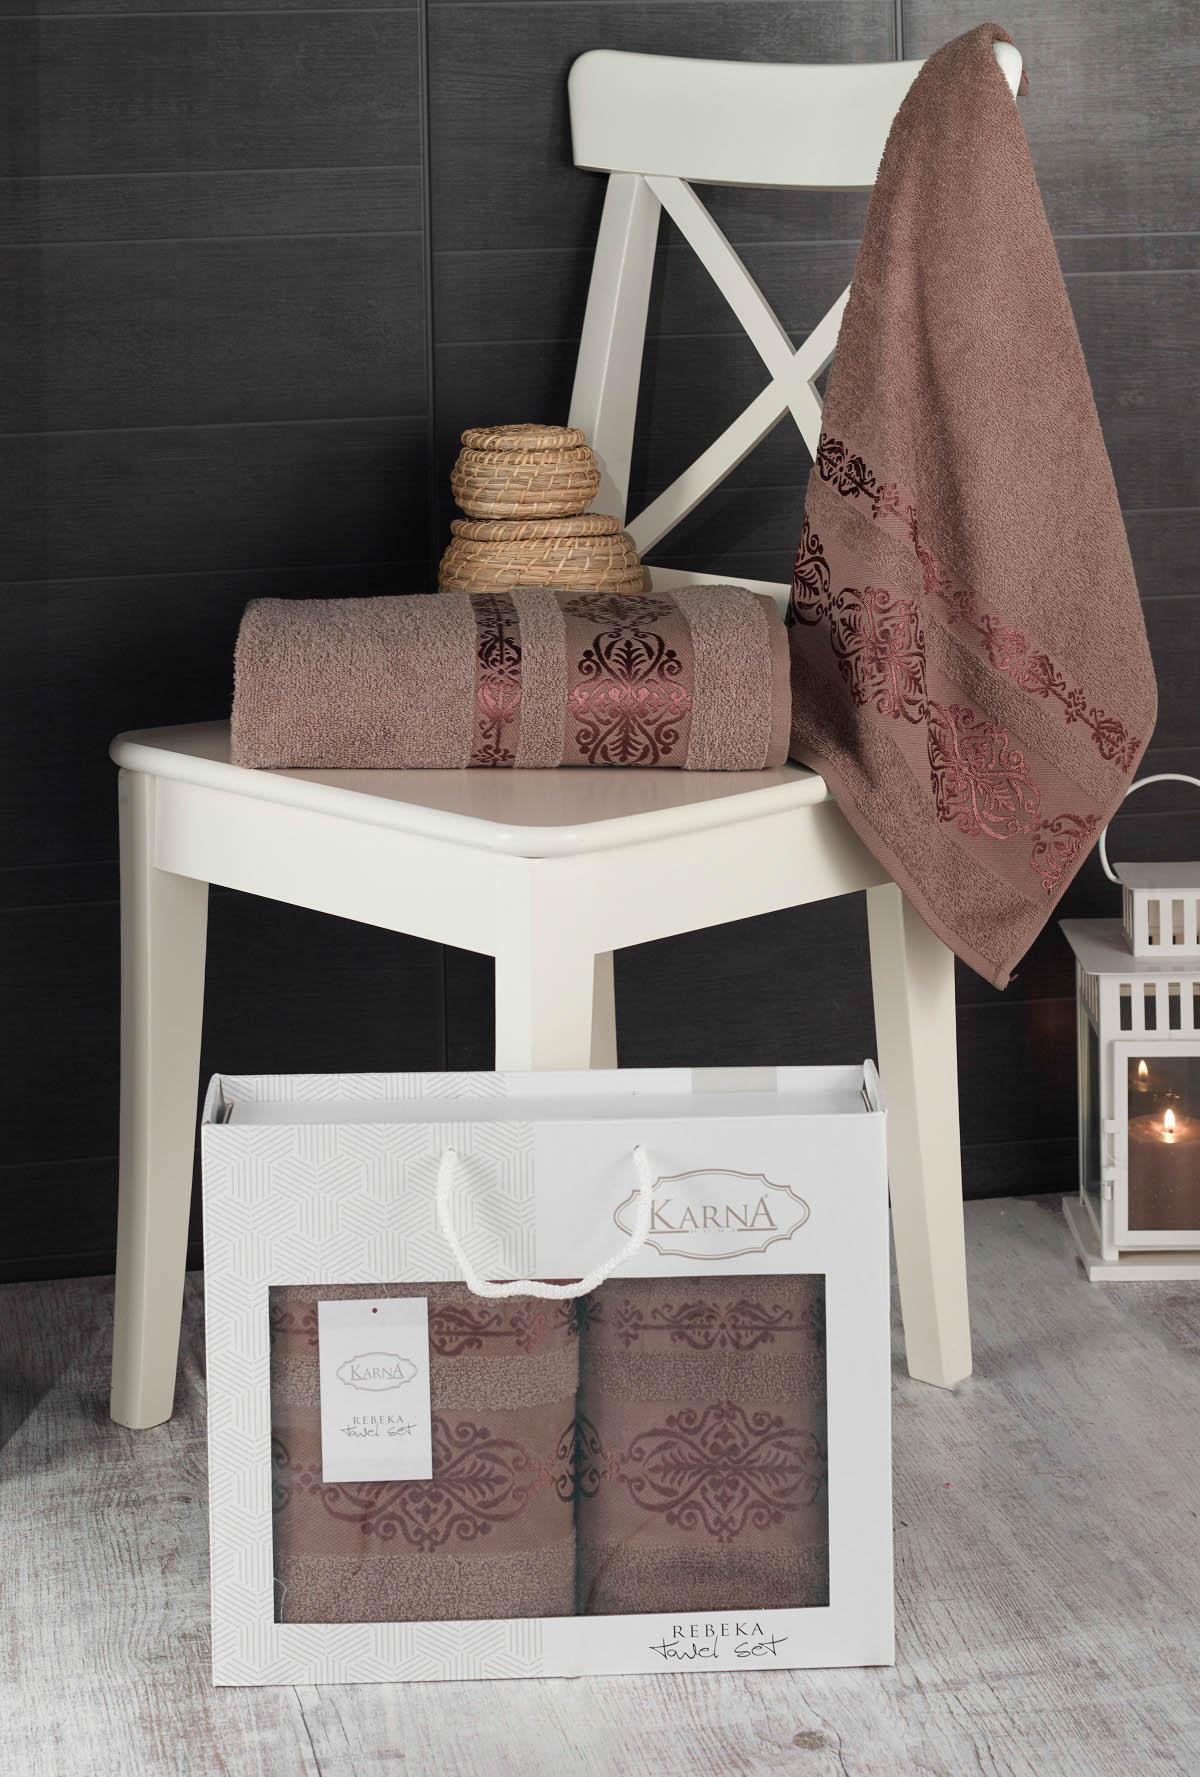 Полотенца Karna Полотенце Rebeca Цвет: Коричневый (50х90 см,70х140 см) цены онлайн